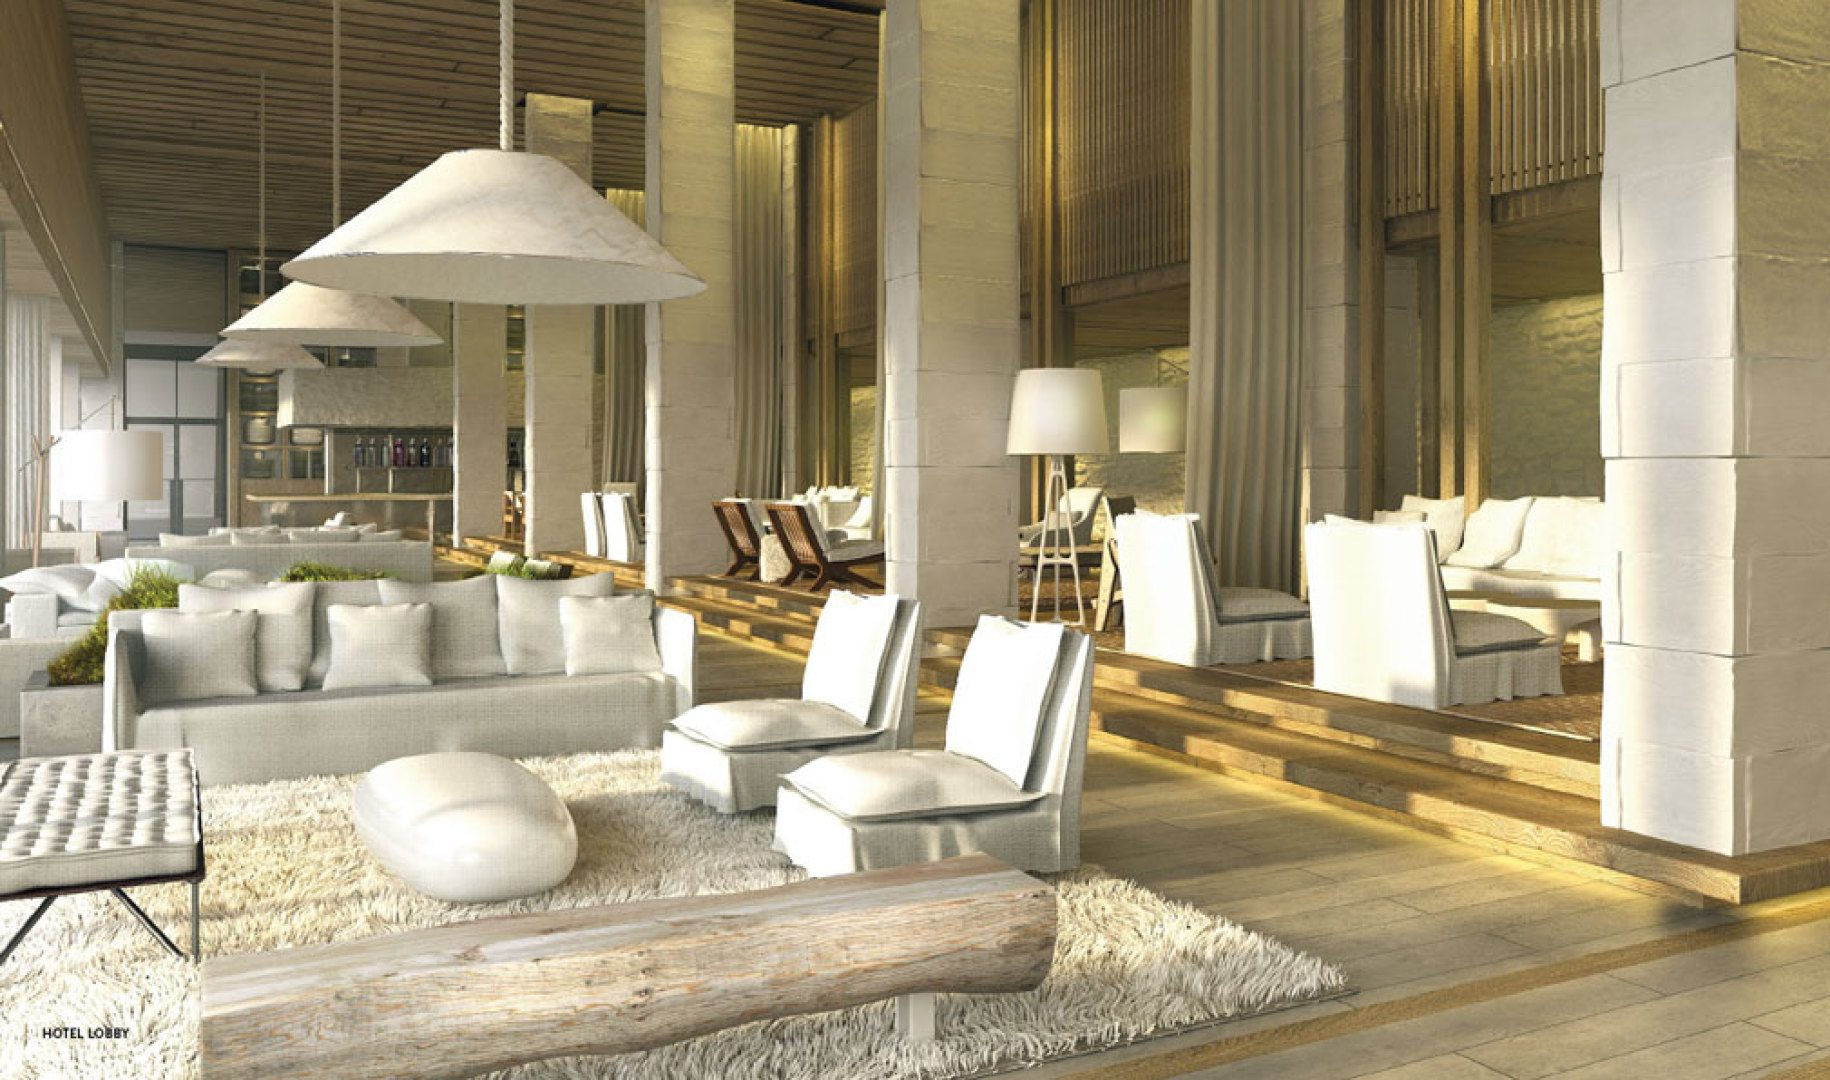 1 Hotel & Homes, Luxury Oceanfront Condos In Miami Beach